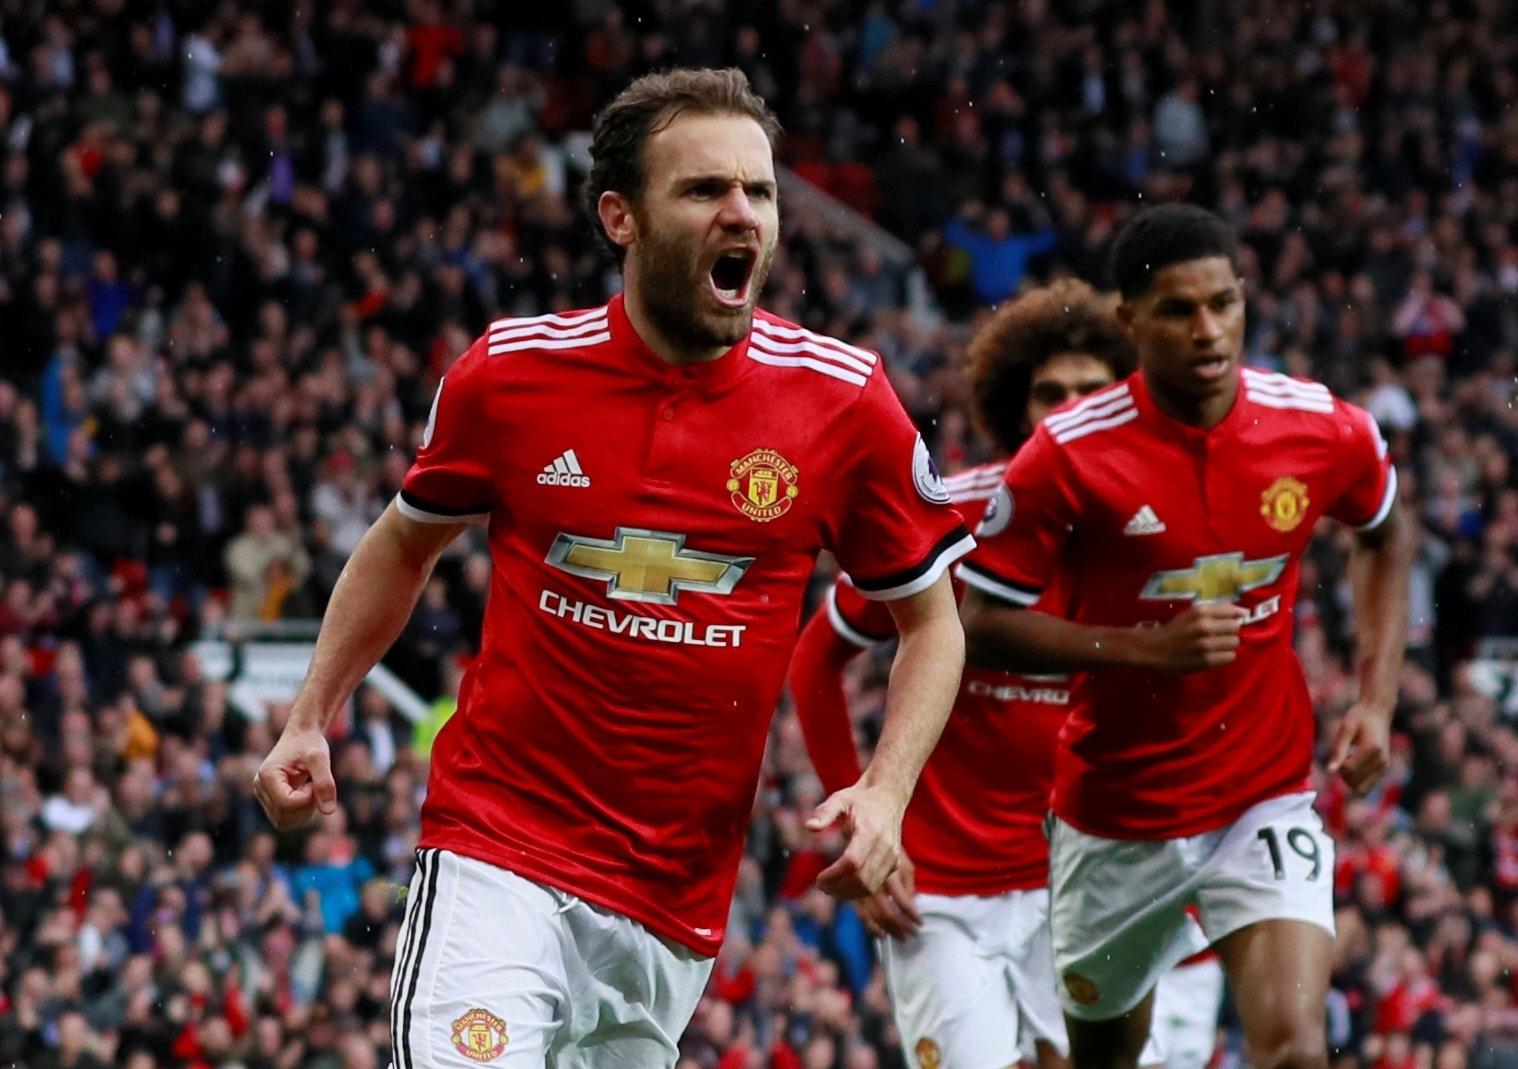 Mata comemora gol para o Manchester United contra o Crystal Palace